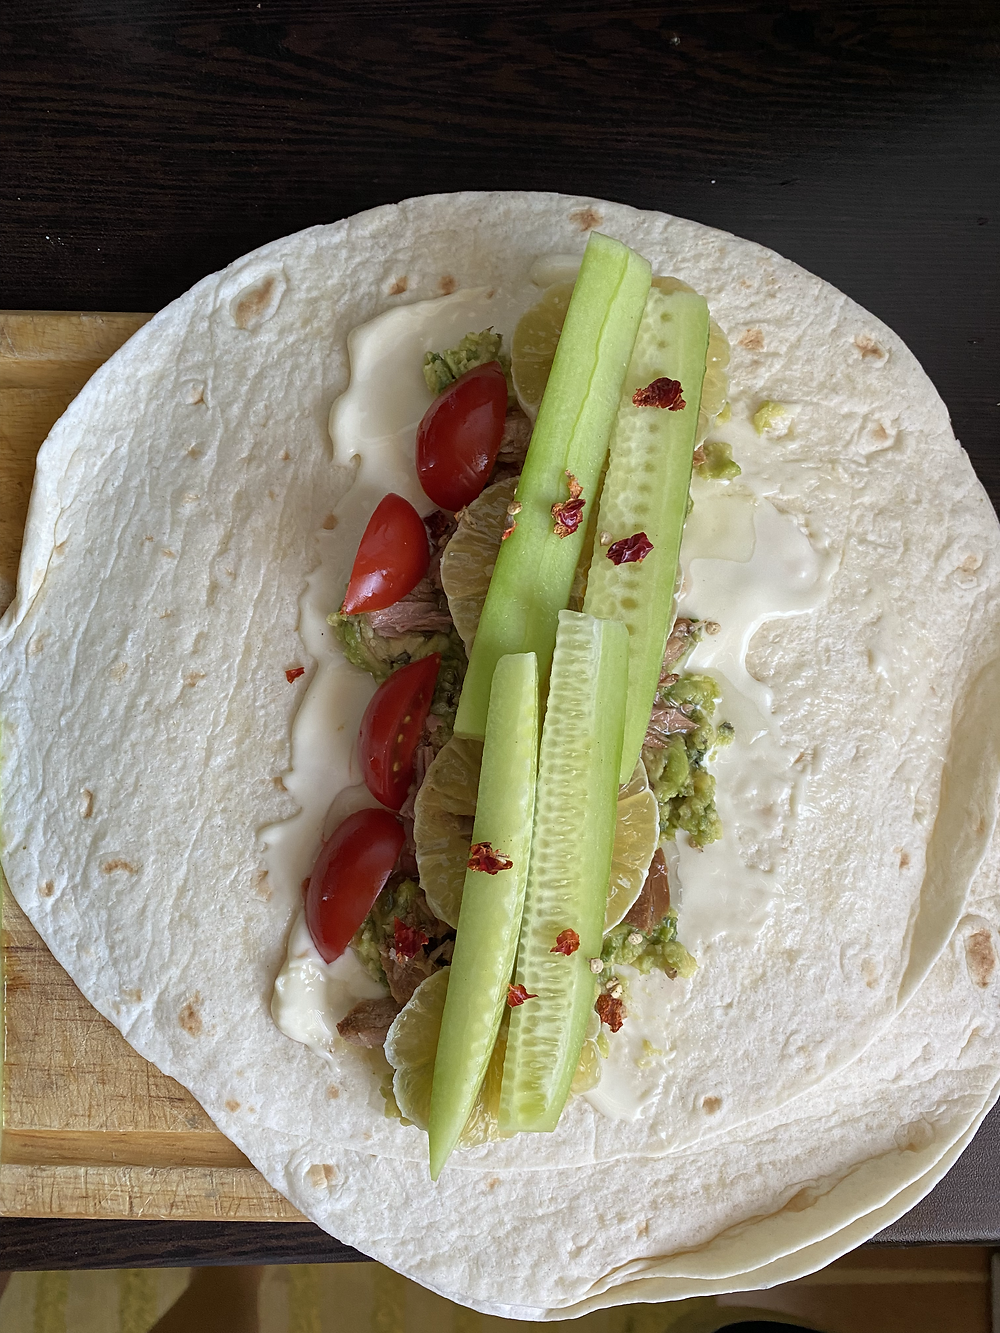 tortilla wrap with tuna and veggies